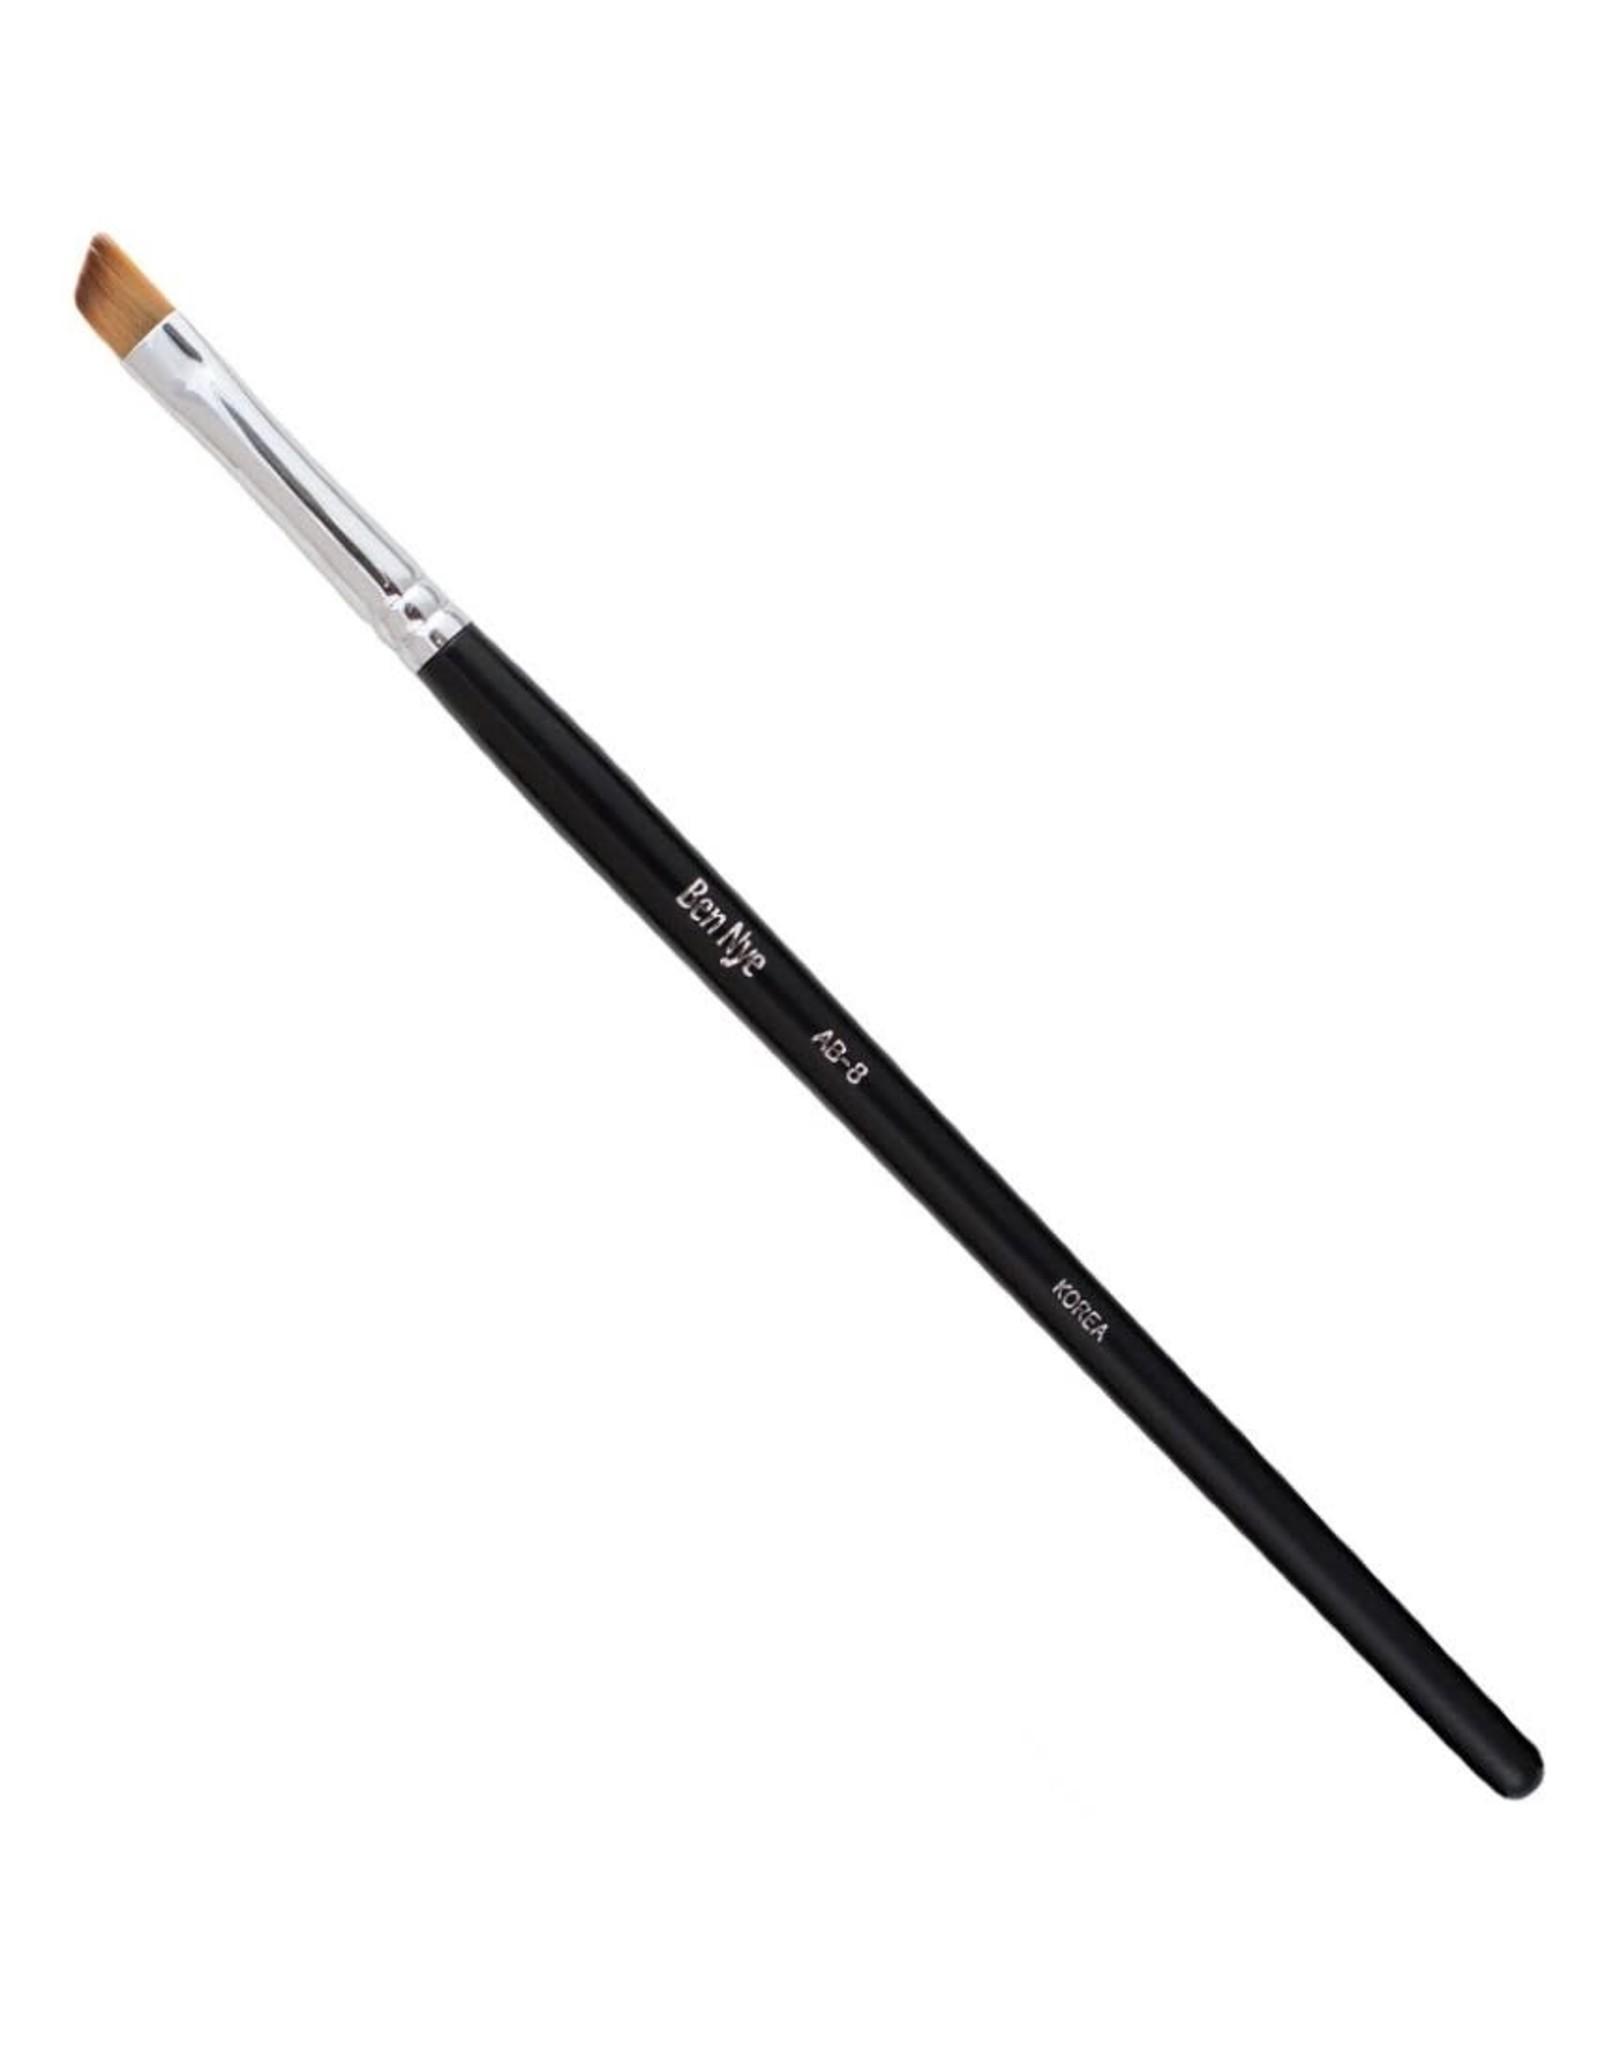 Ben Nye Wide Angle Brush